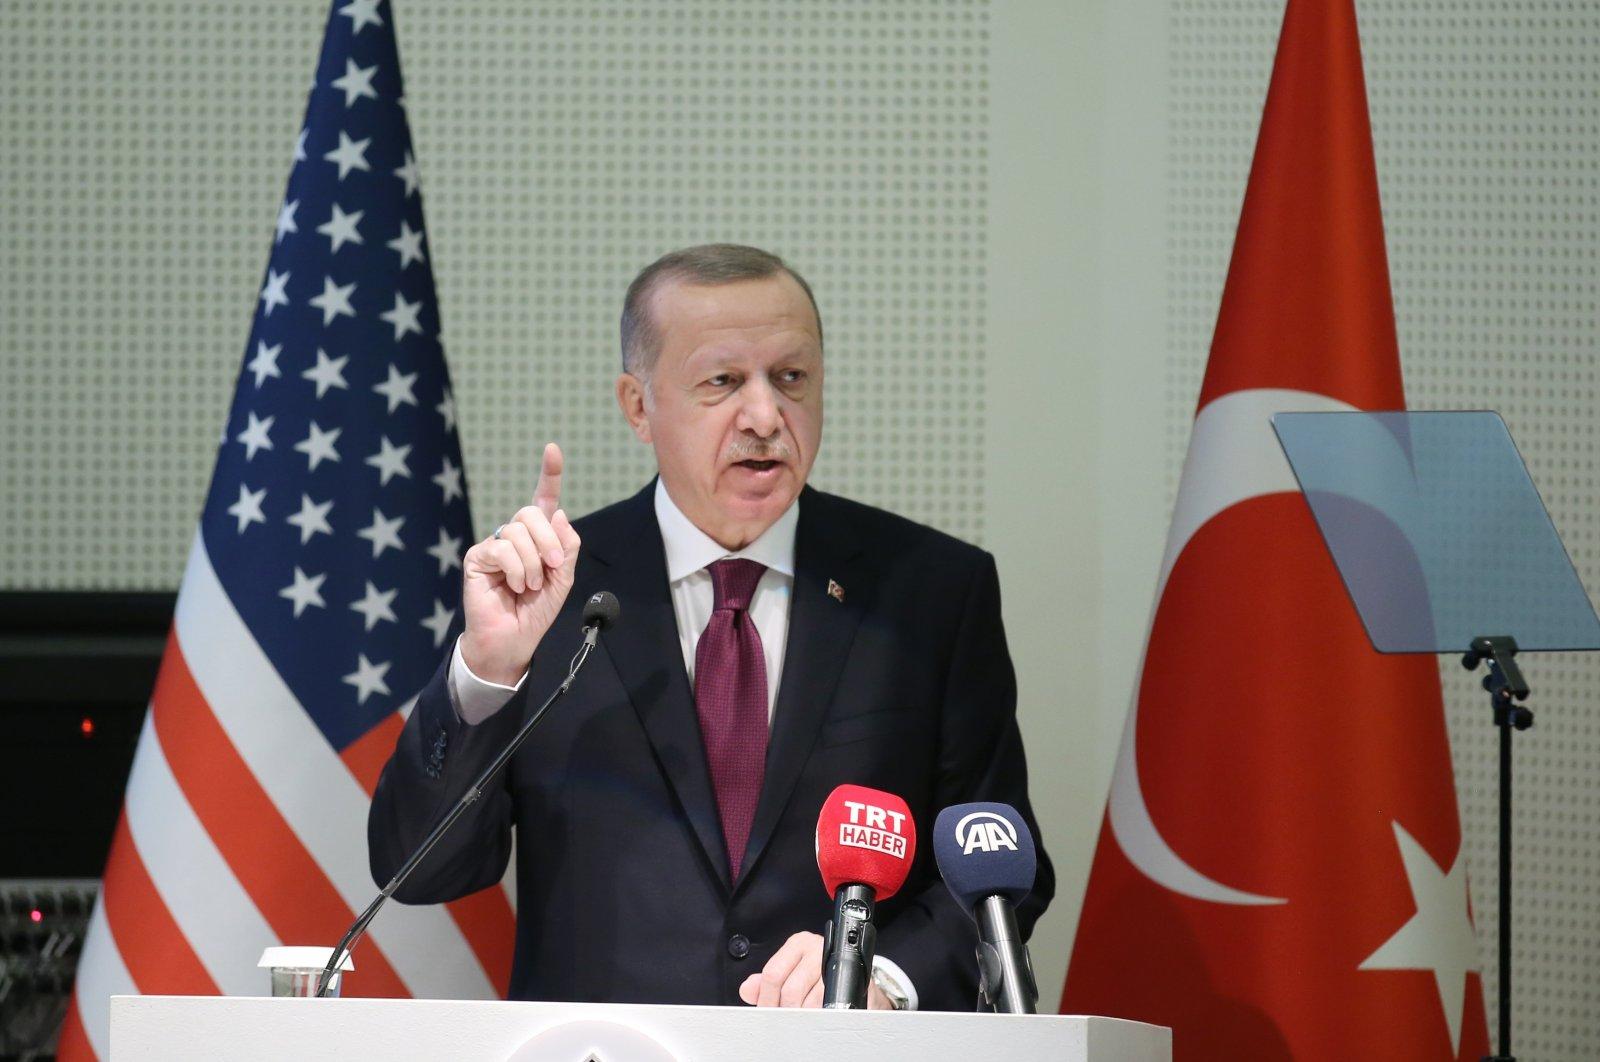 President Recep Tayyip Erdoğan at an event organized by the Turkish community in Lanham, Maryland, U.S., Nov. 15, 2019. (AA Photo)